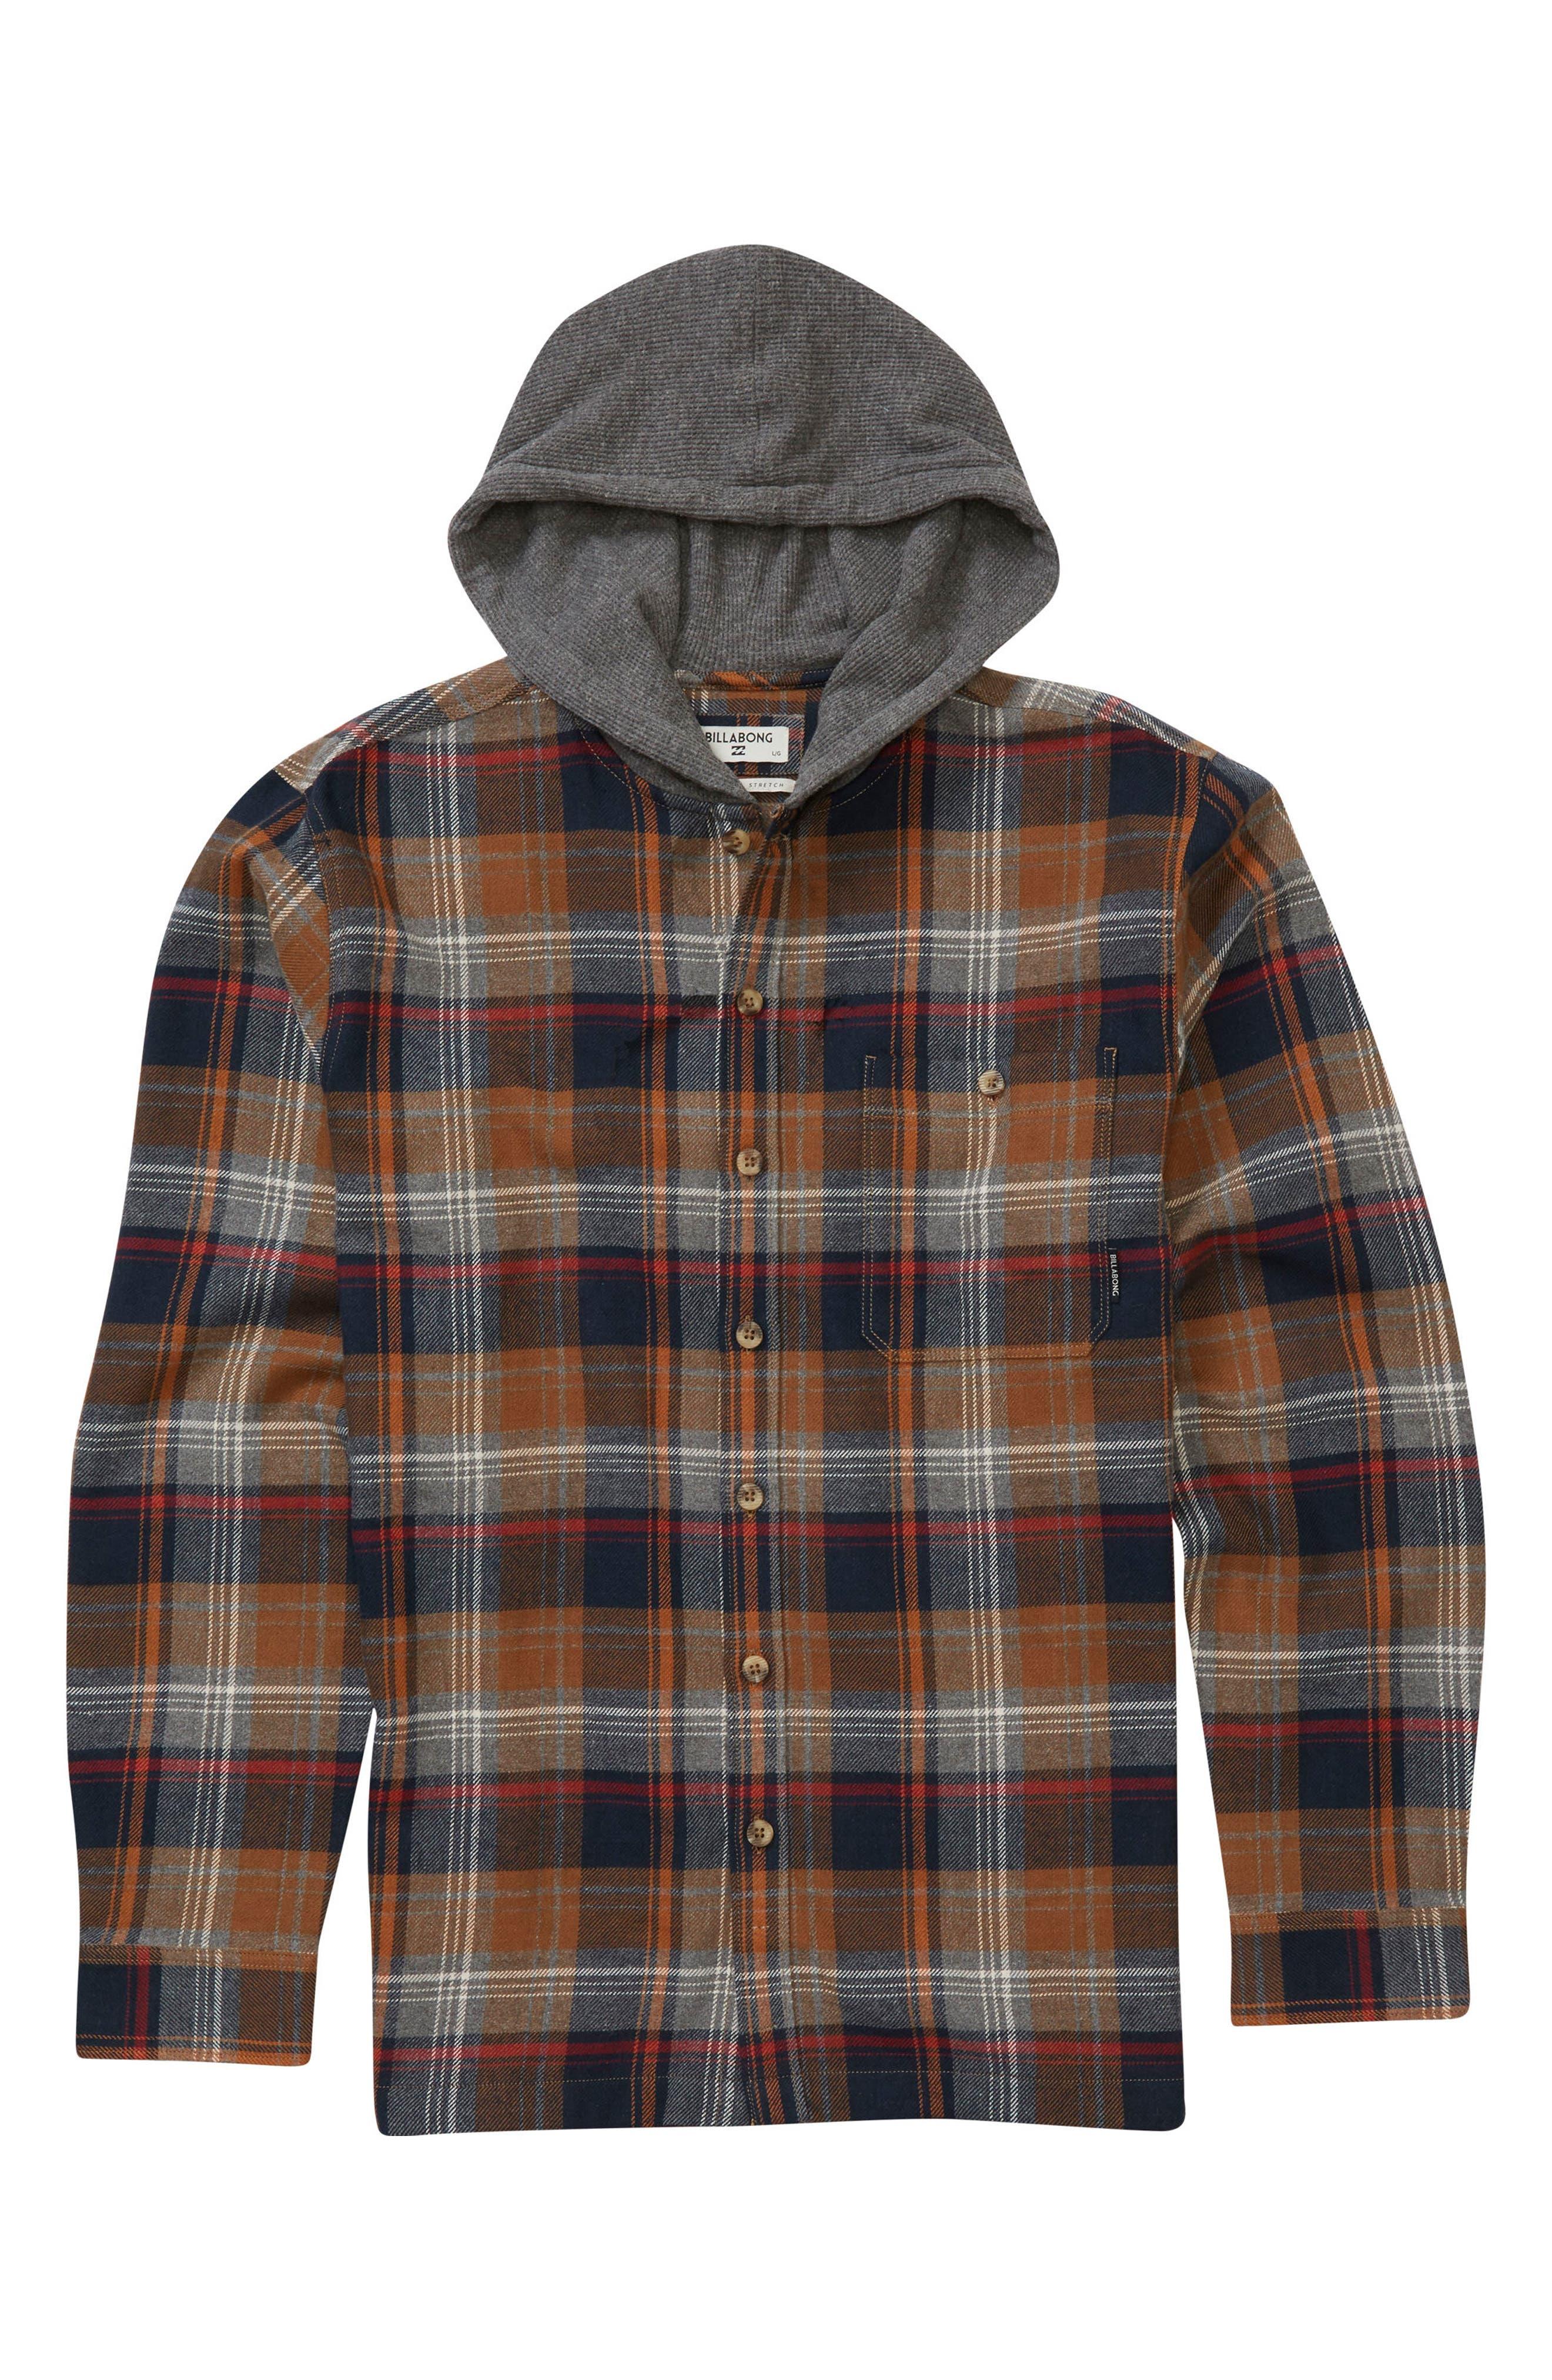 Baja Hooded Flannel,                             Main thumbnail 1, color,                             204